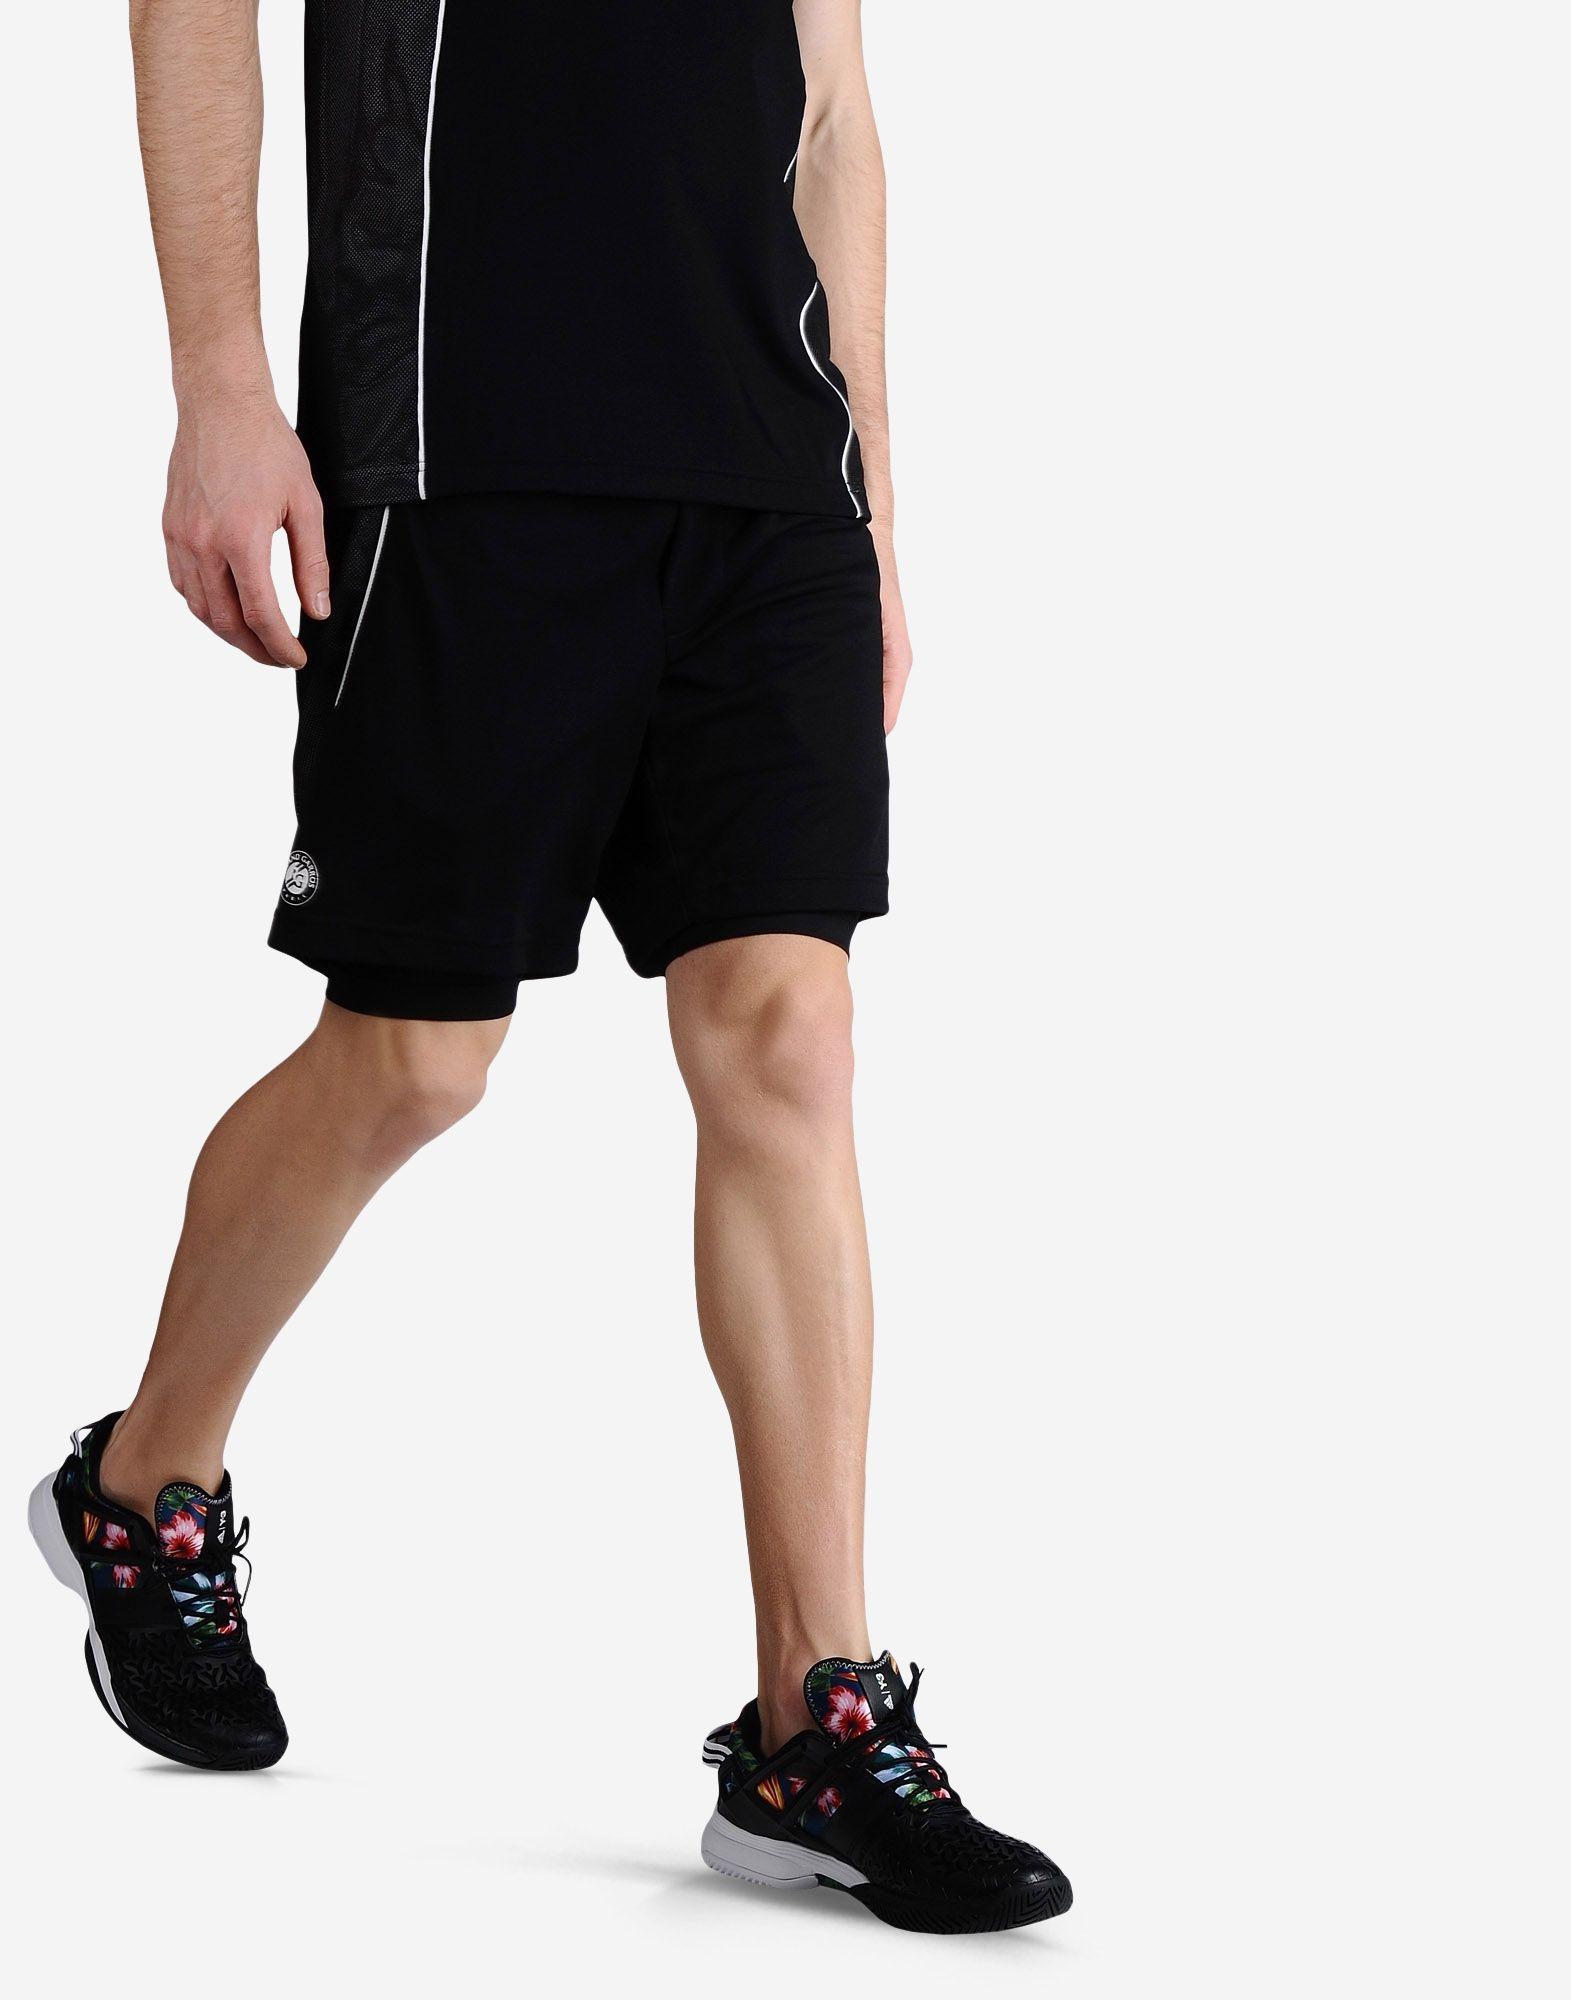 ef0e3193d11 ... Y-3 Roland Garros Y-3 Player Short Shorts Man ...